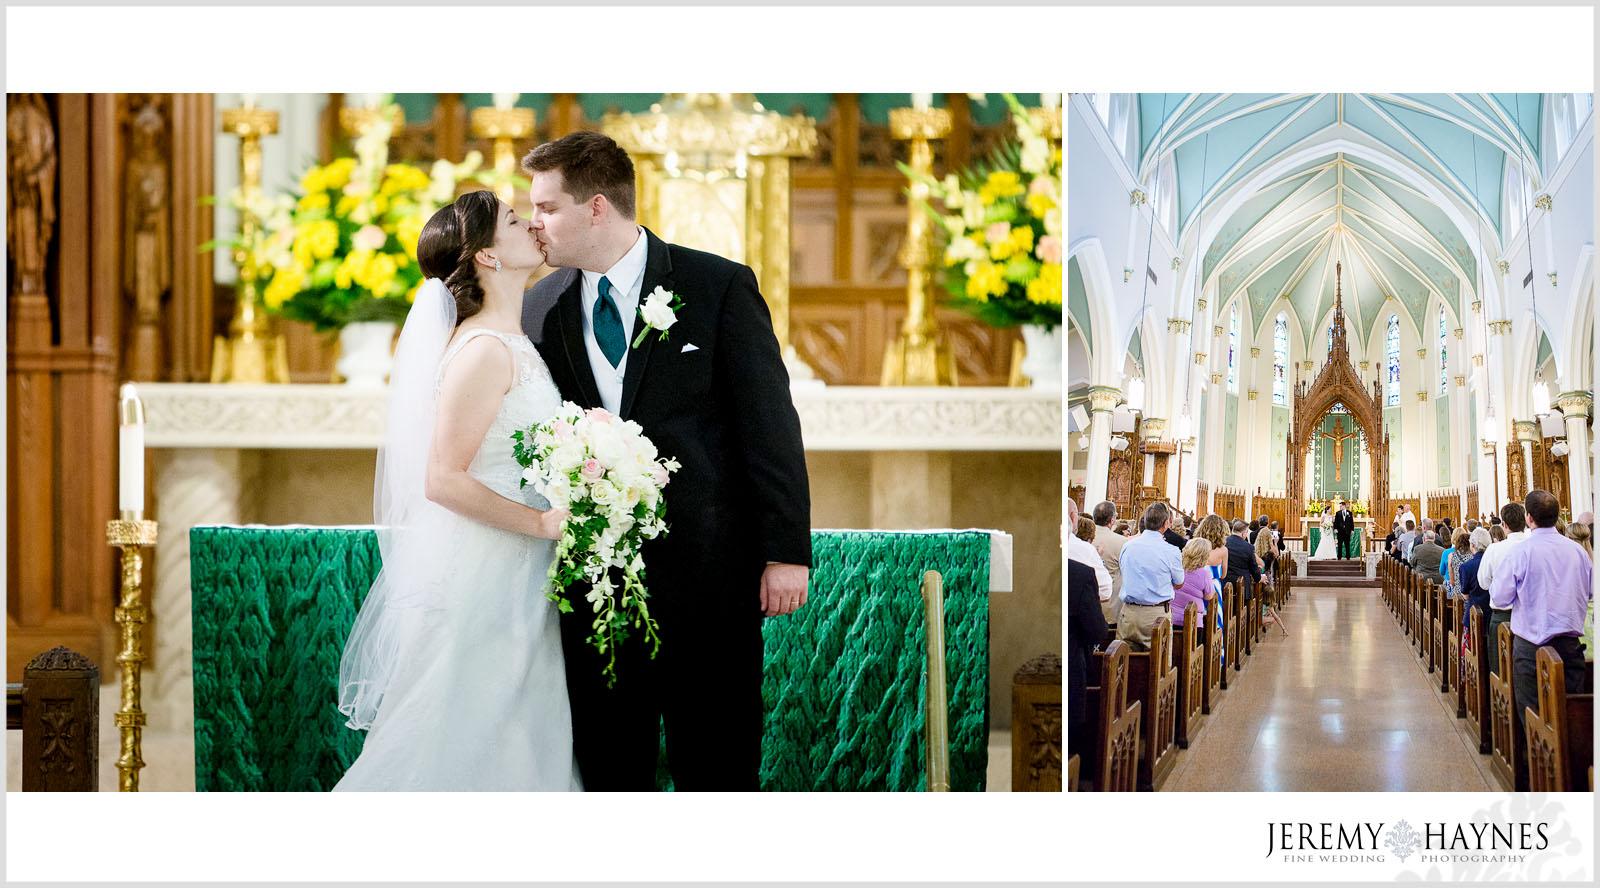 st-louis-bertrand-catholic-church-wedding-ceremony-6.jpg